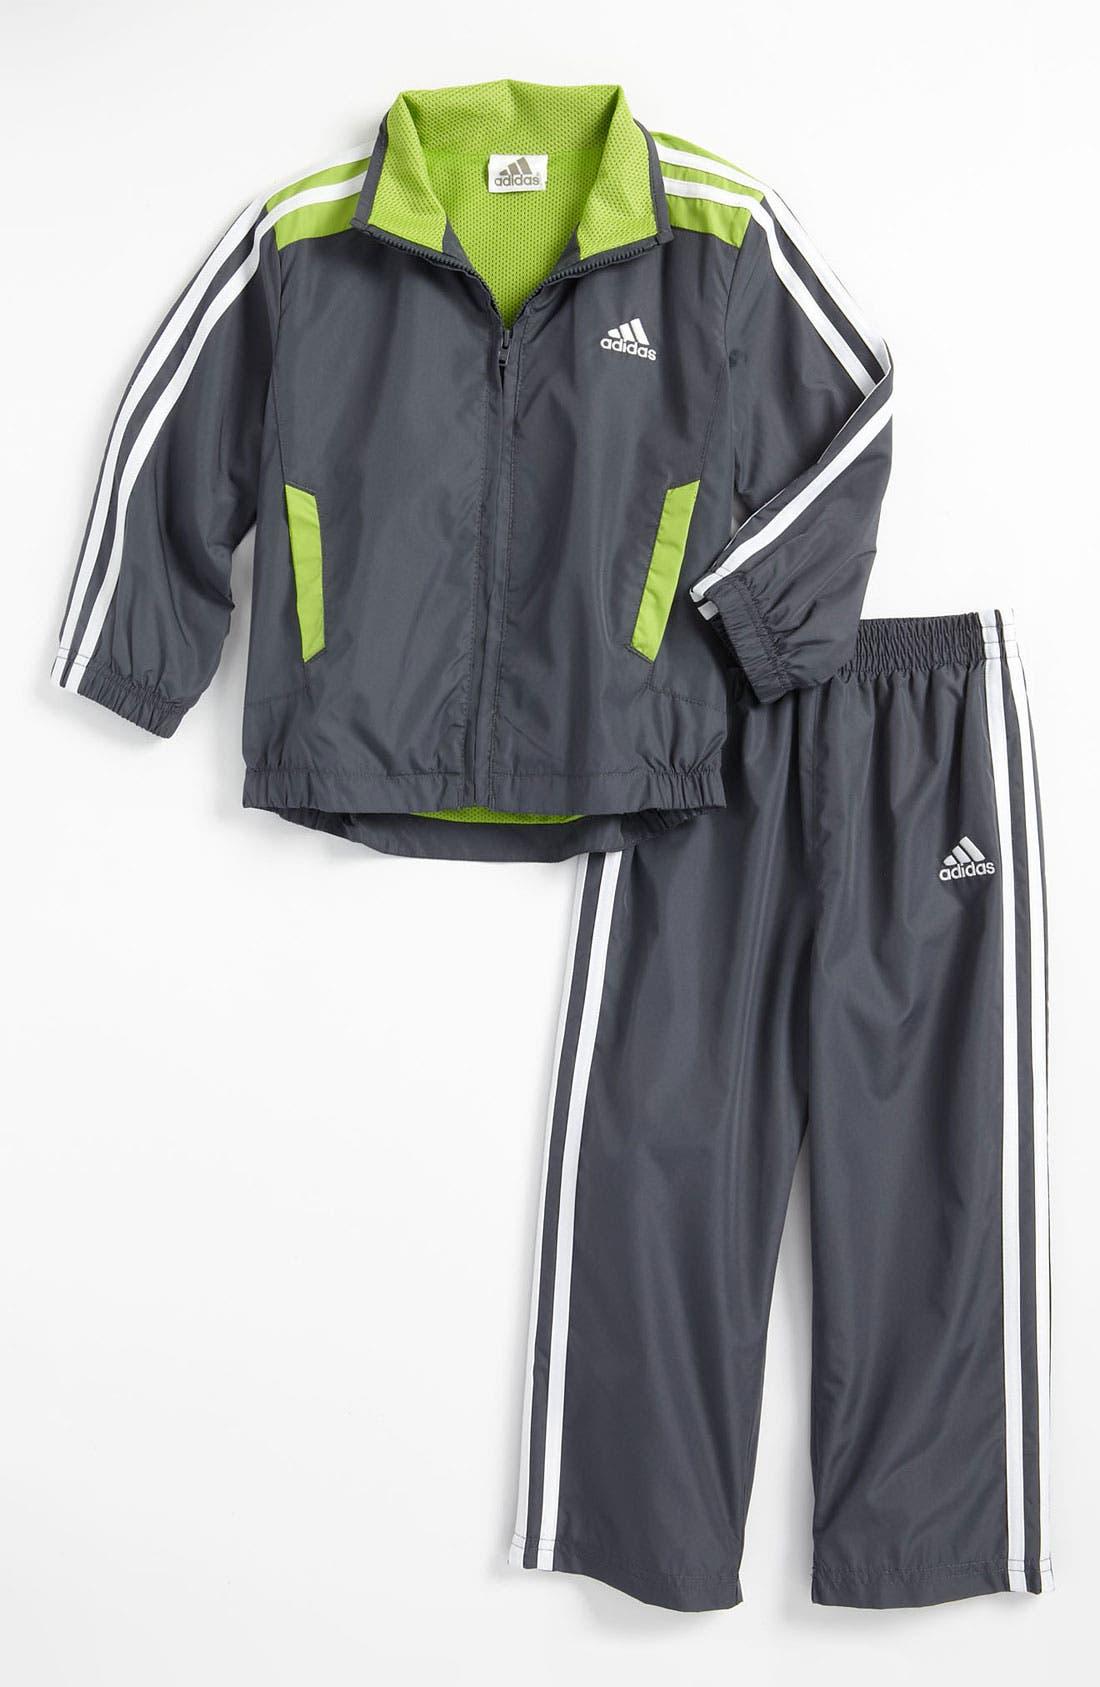 Main Image - adidas 'Essential Q15' Jacket & Pants (Toddler)